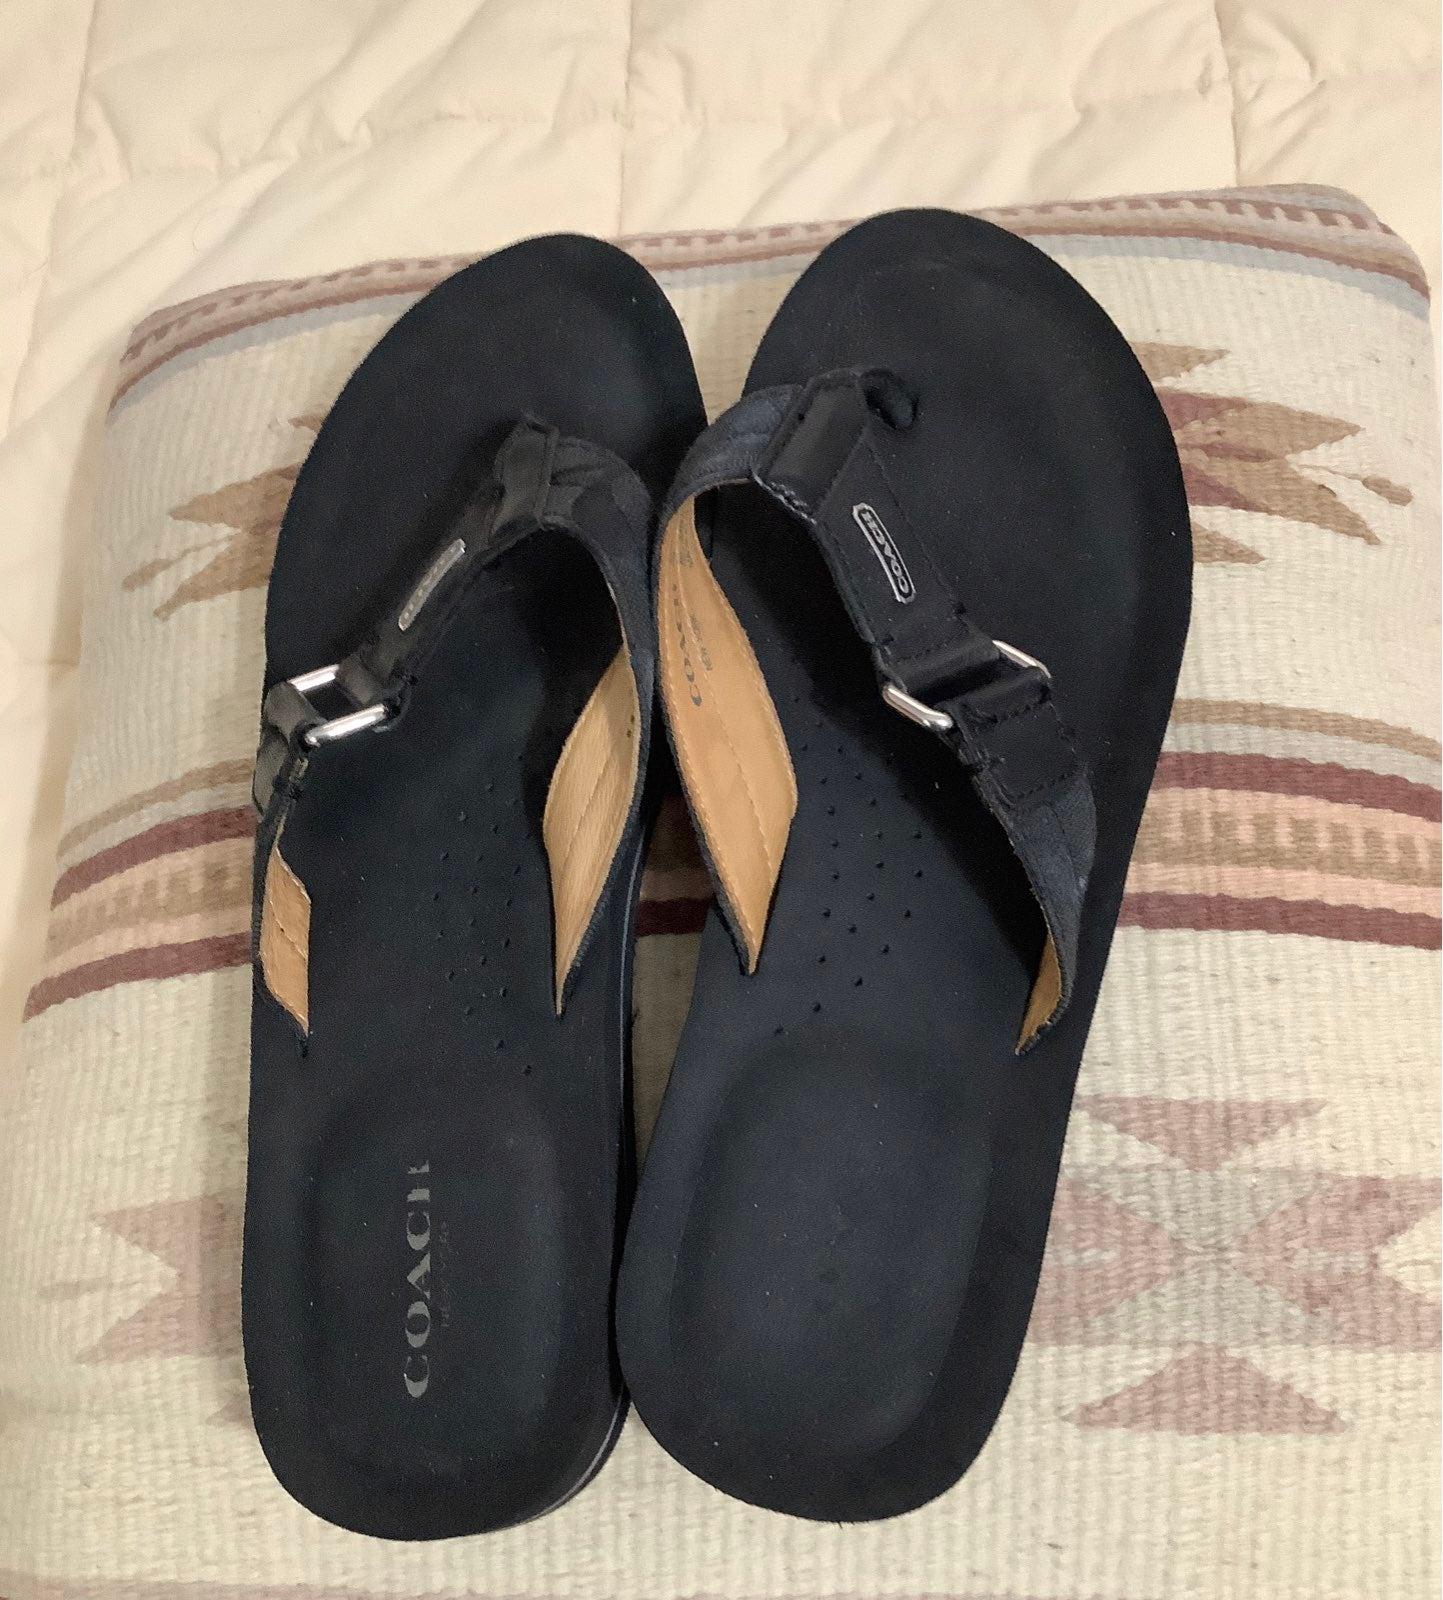 Coach flip flops sandals